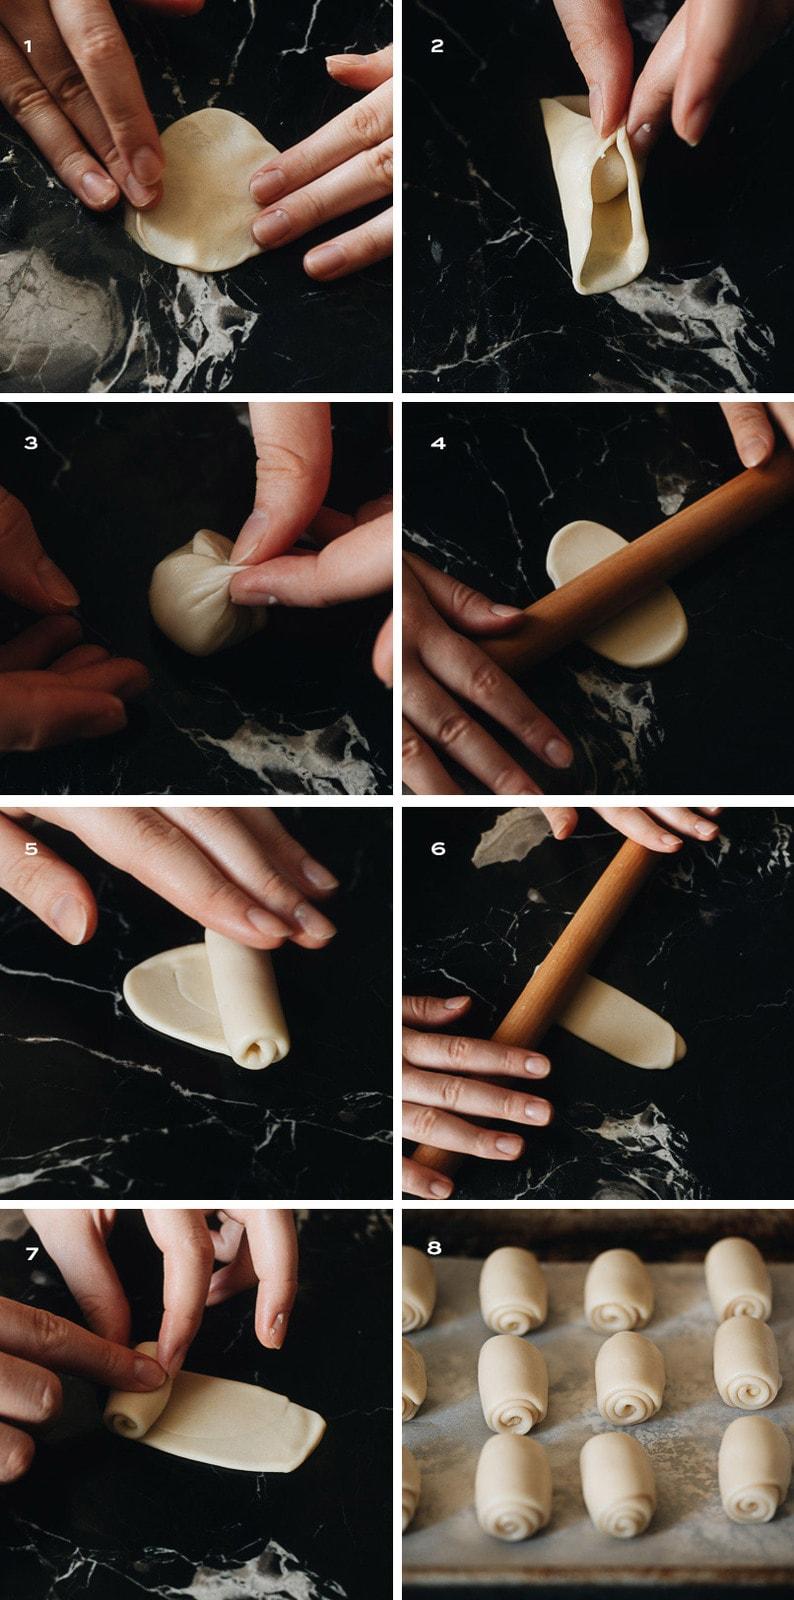 How to prepare mooncake skin dough step-by-step